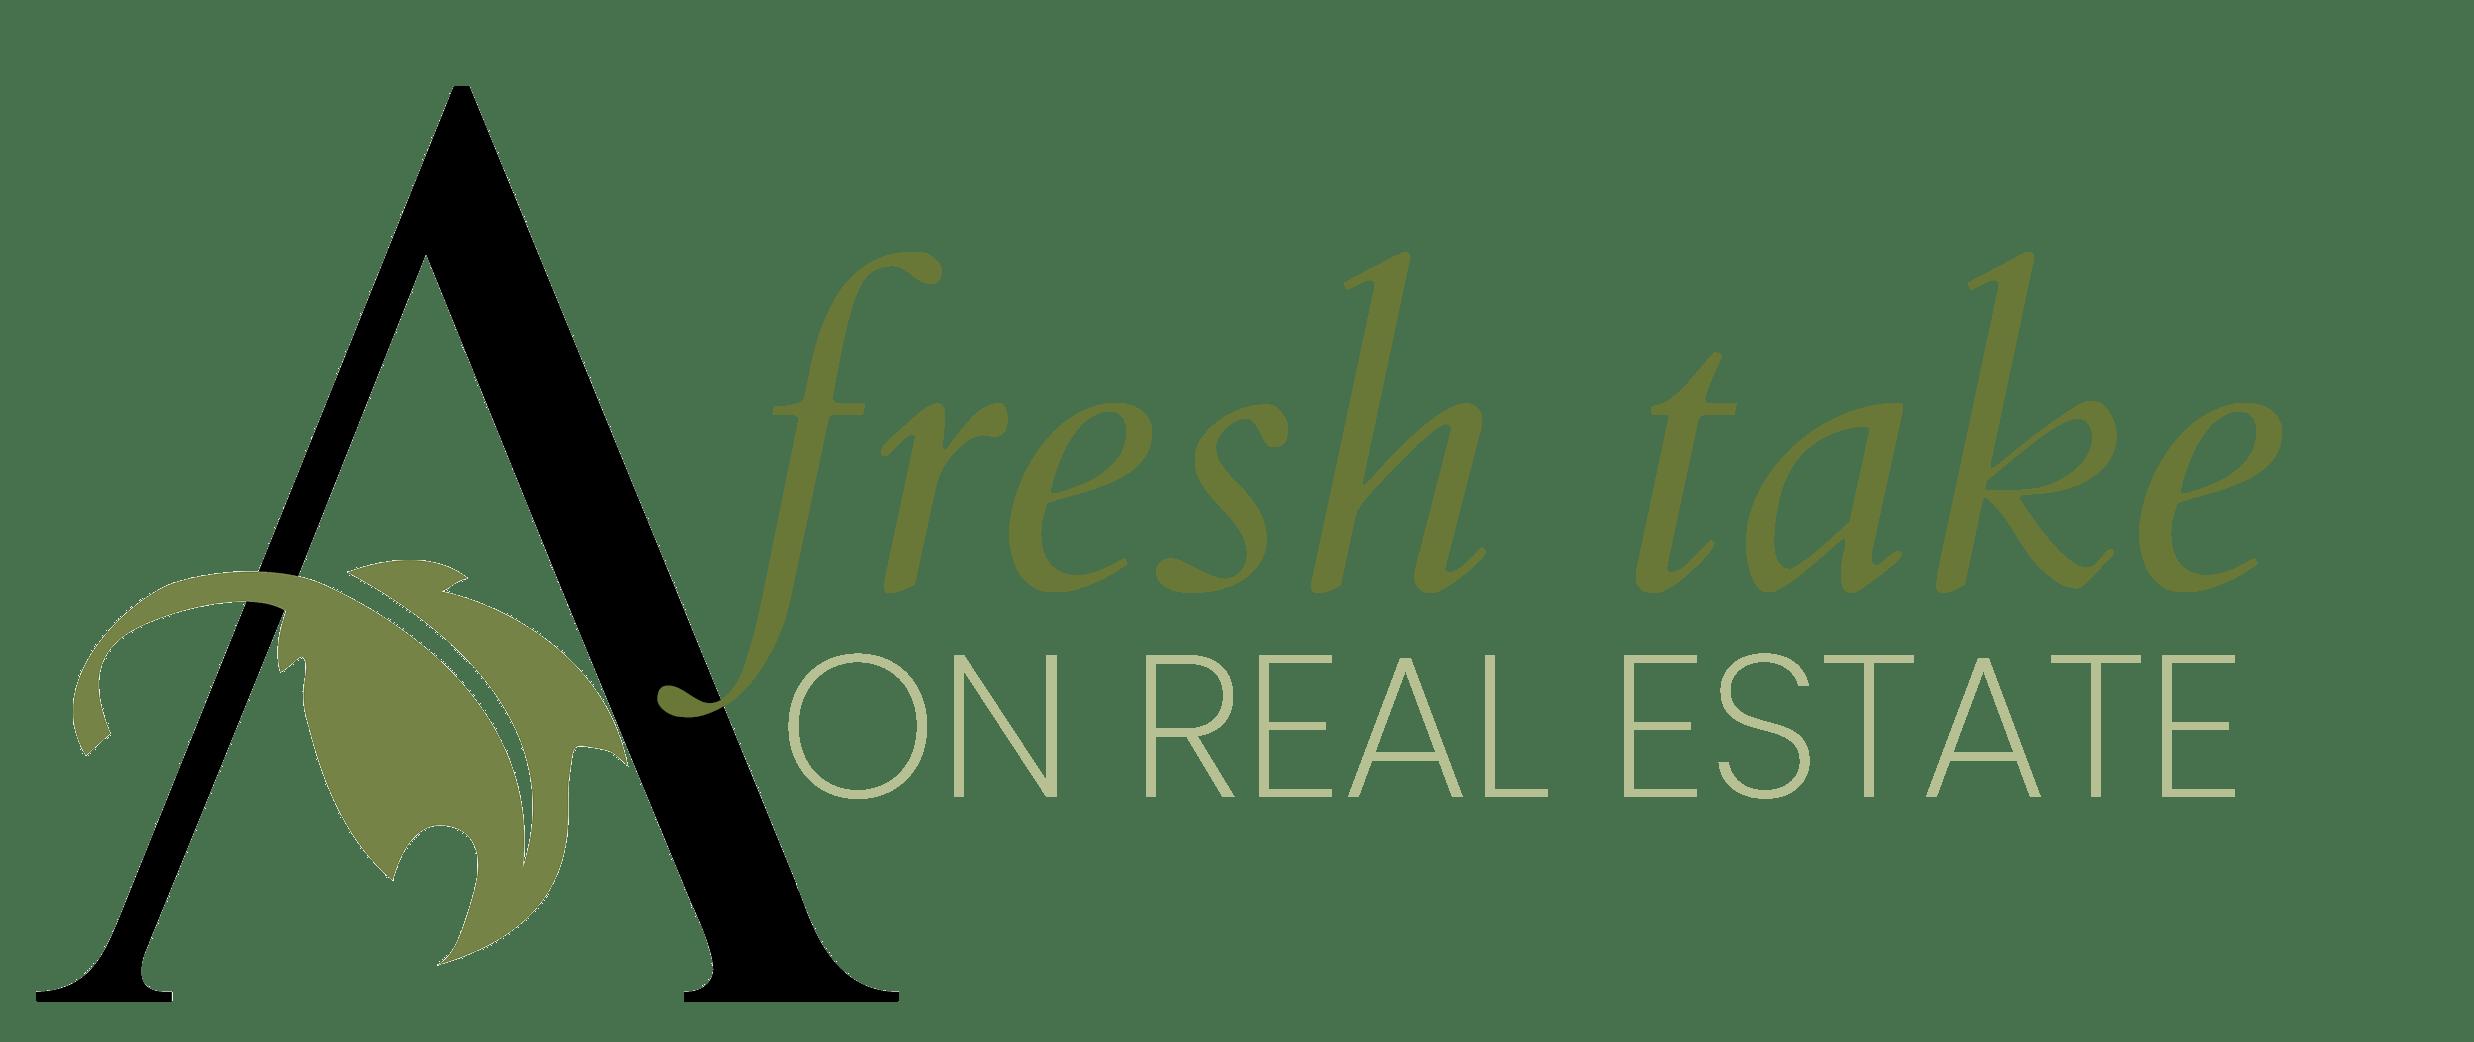 A Fresh Take on Real Estate